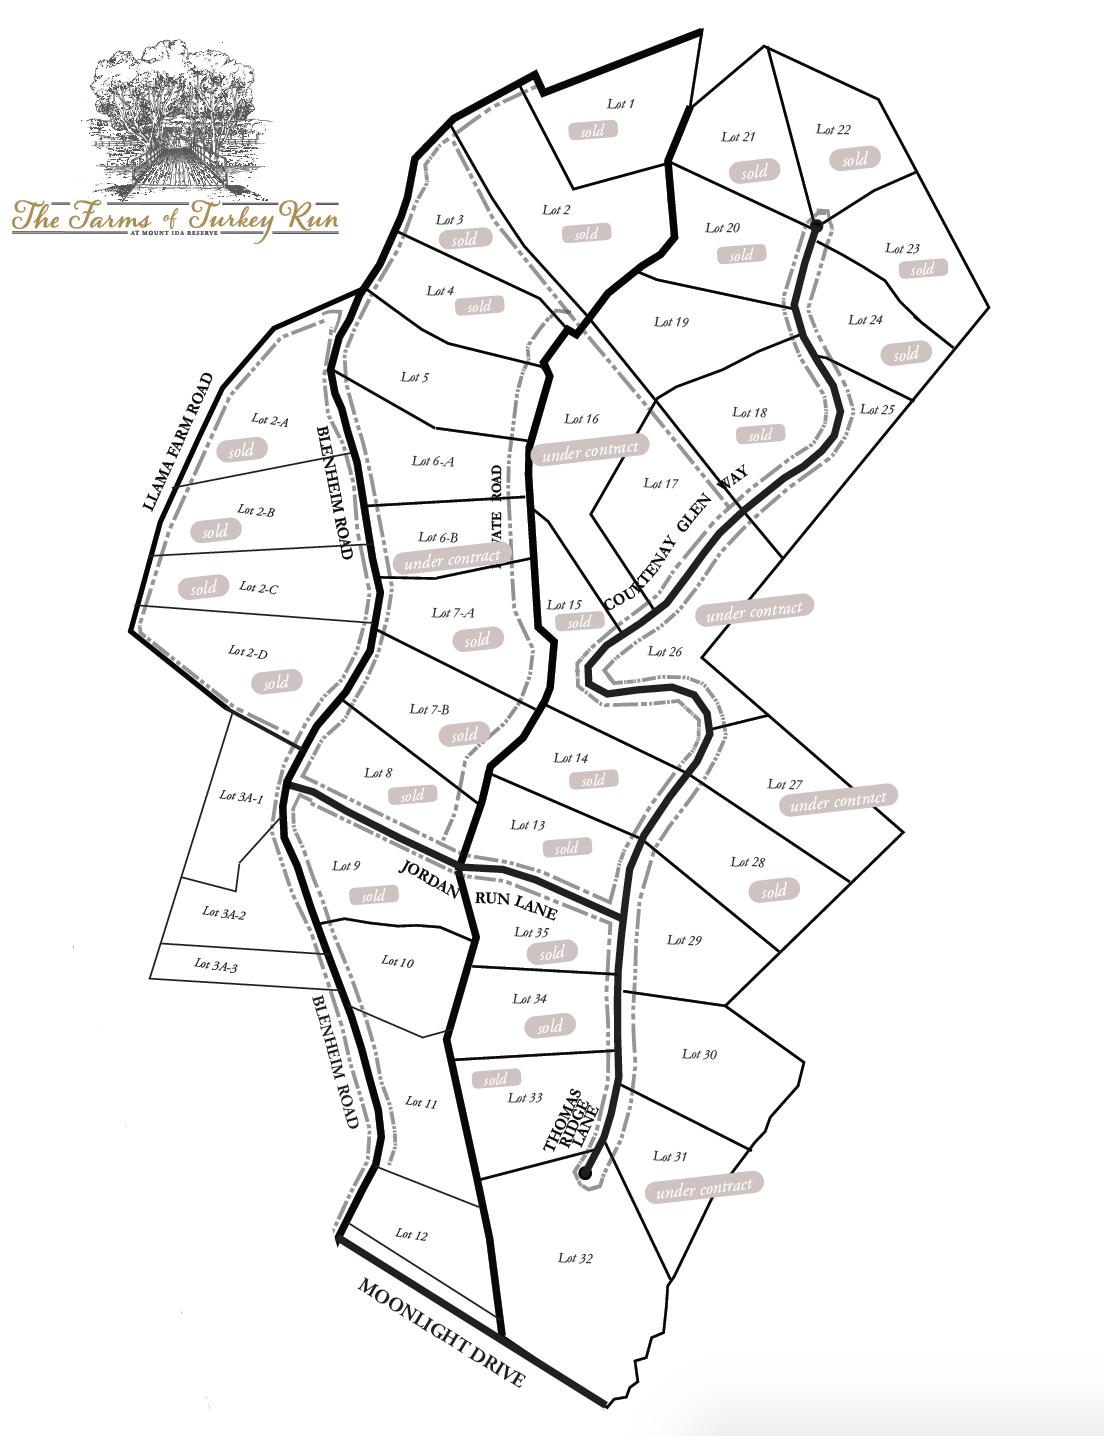 The Farms of Turkey Run map